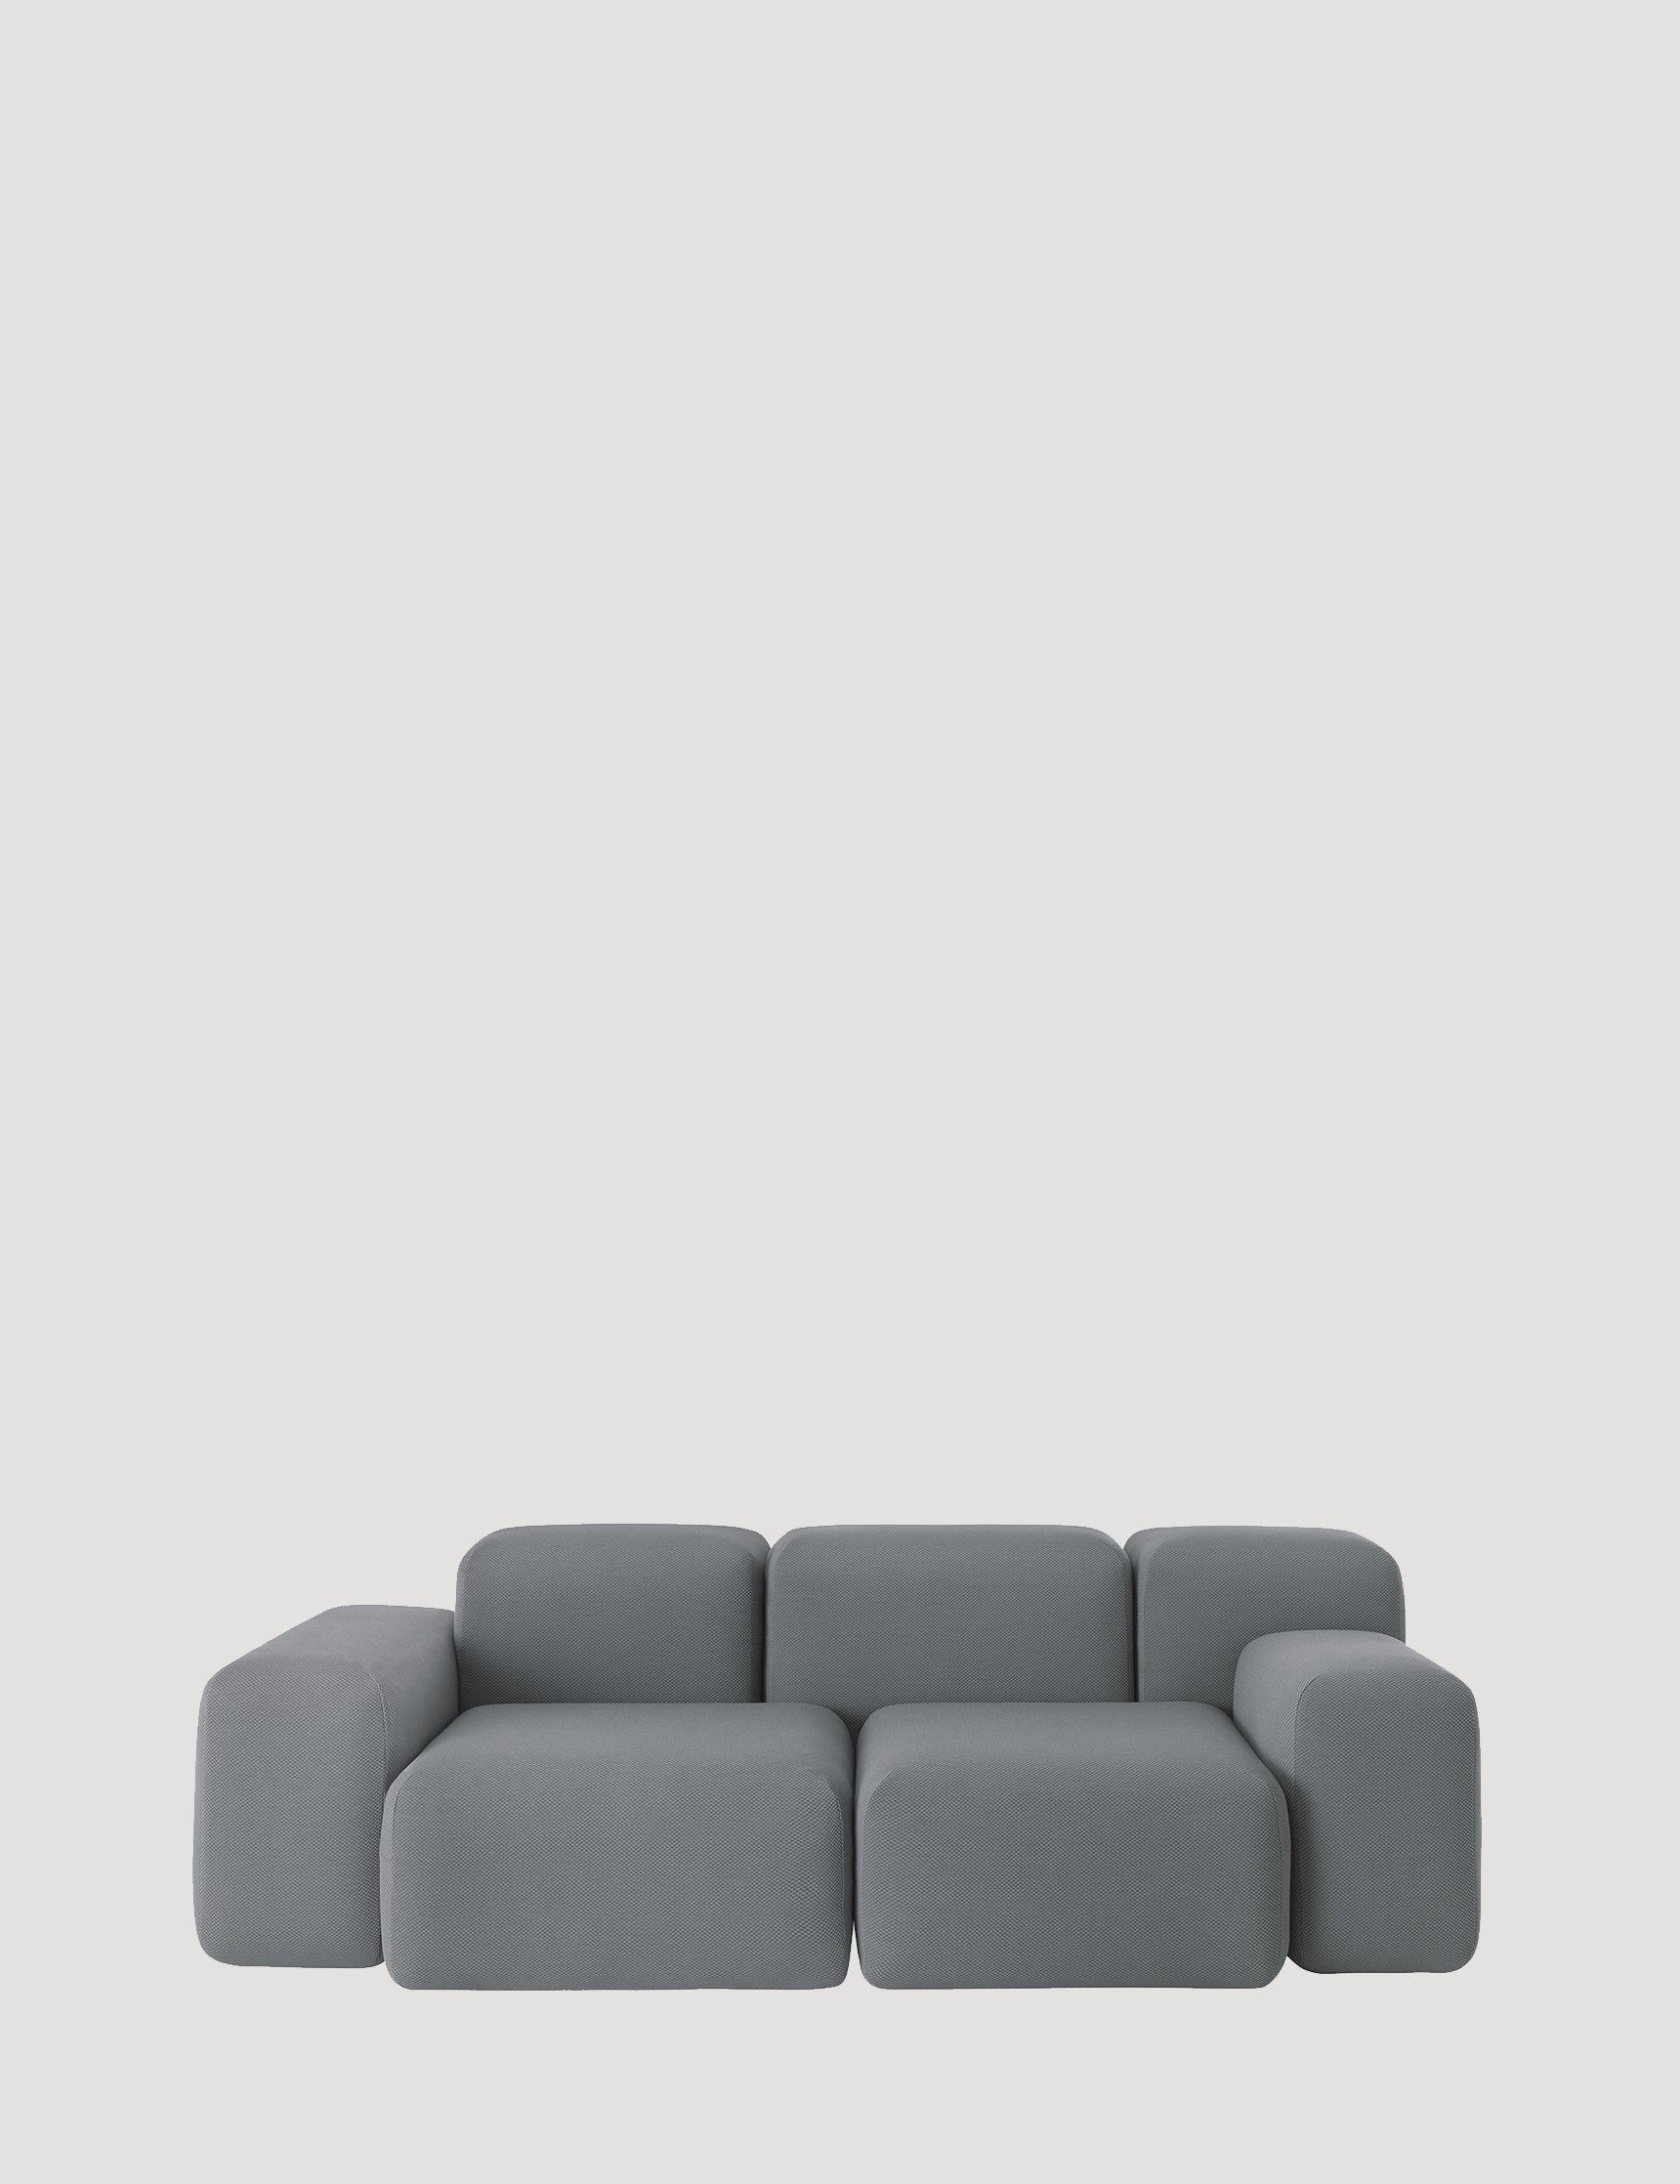 Soft Blocks 2 Seater Soft Blocks Furniture Design Modern Furniture